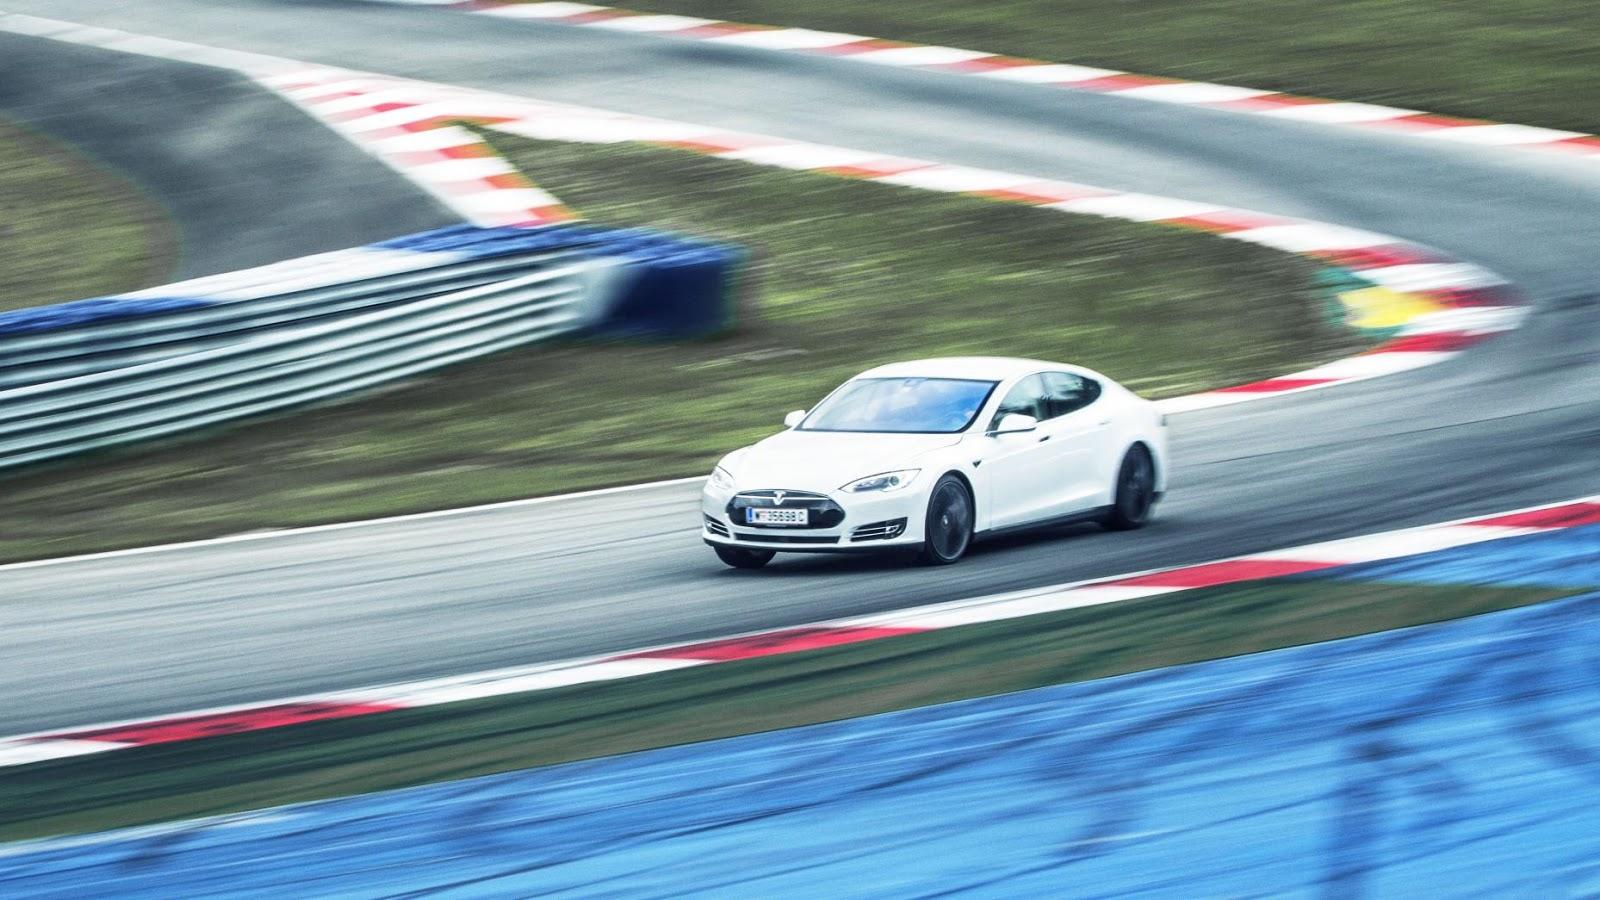 Tesla Model S P90D - tăng tốc từ 0 - 96 km/h trong 2.8secs